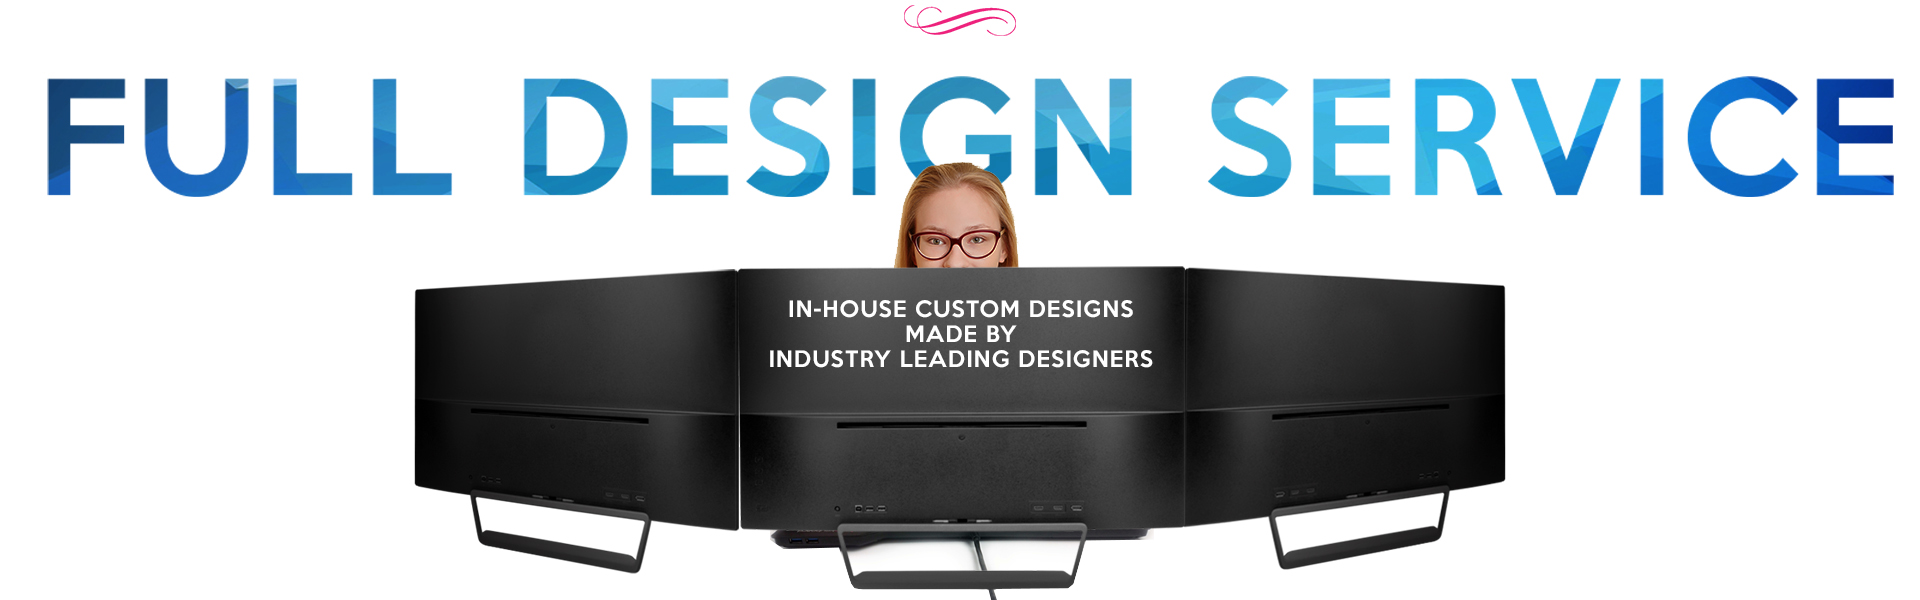 designbanner3.jpg